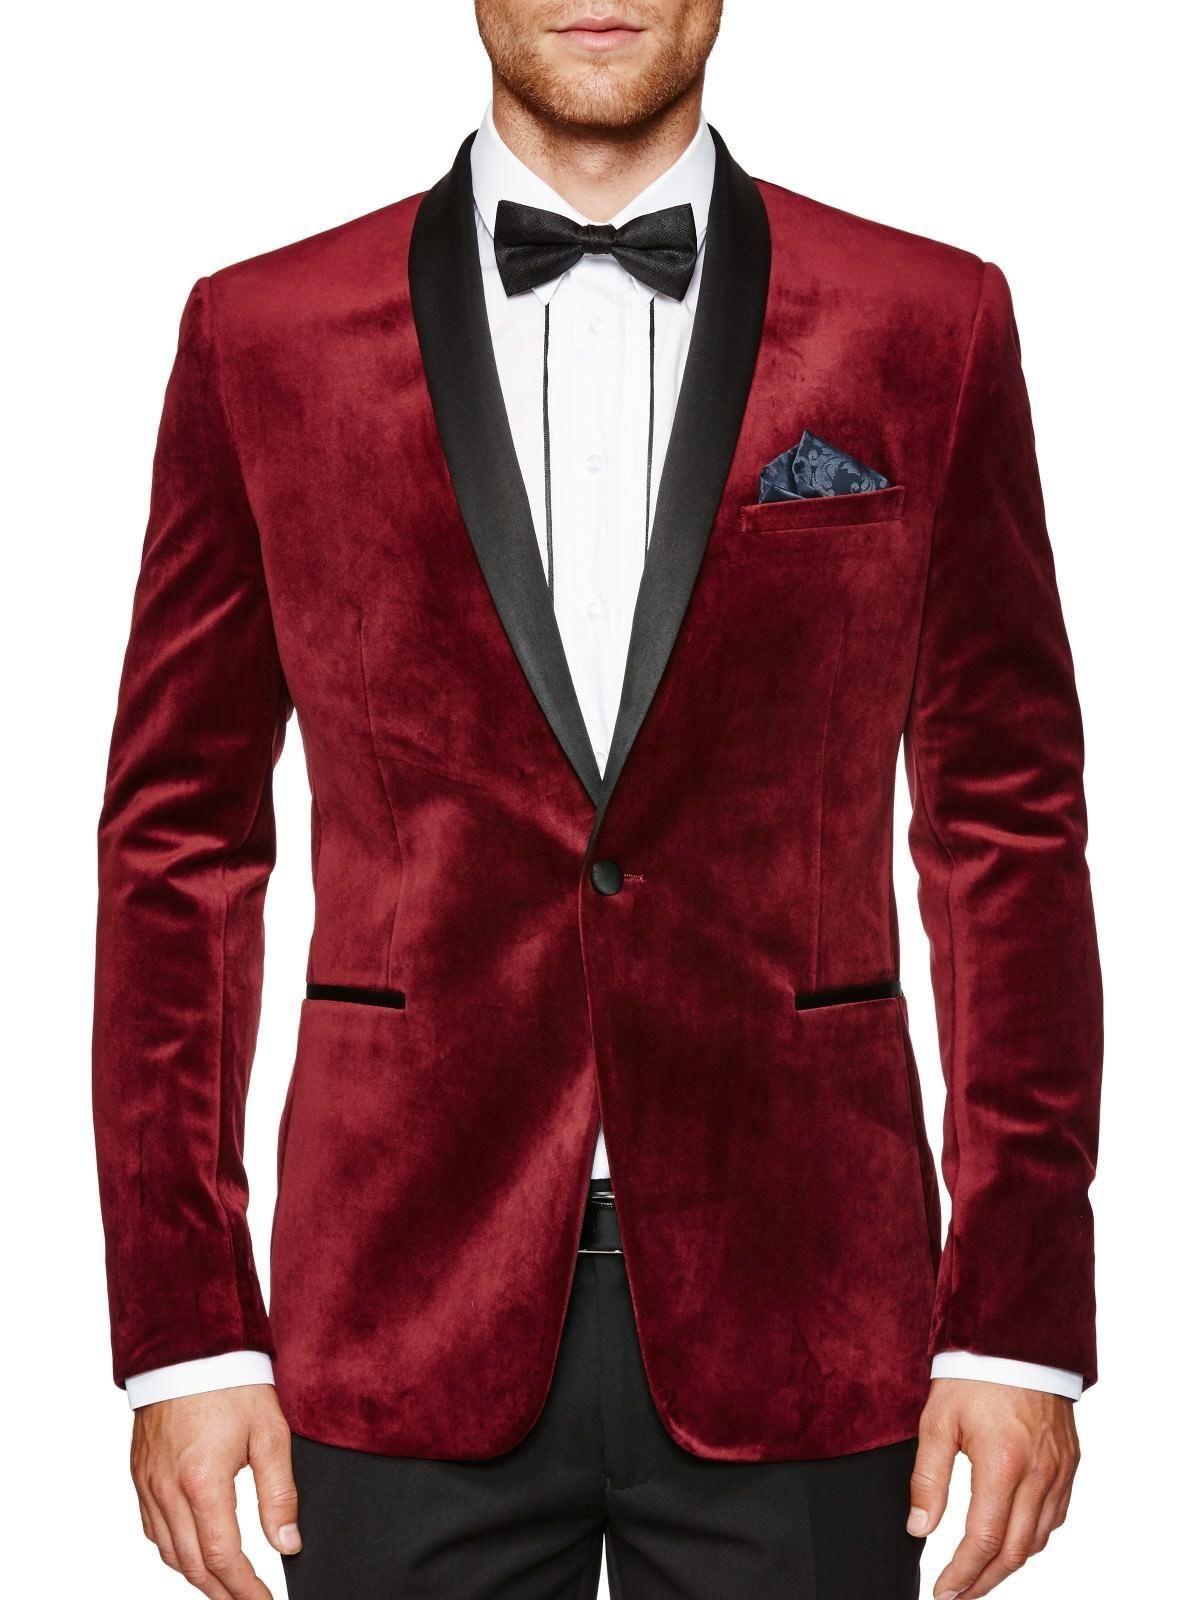 Traje de vino de solapa solapa Novio Esmoquin, guapo Slim Fit hombres boda padrinos de boda fiesta de negocios trajes de baile (chaqueta + pantalones + corbata) NO: 703